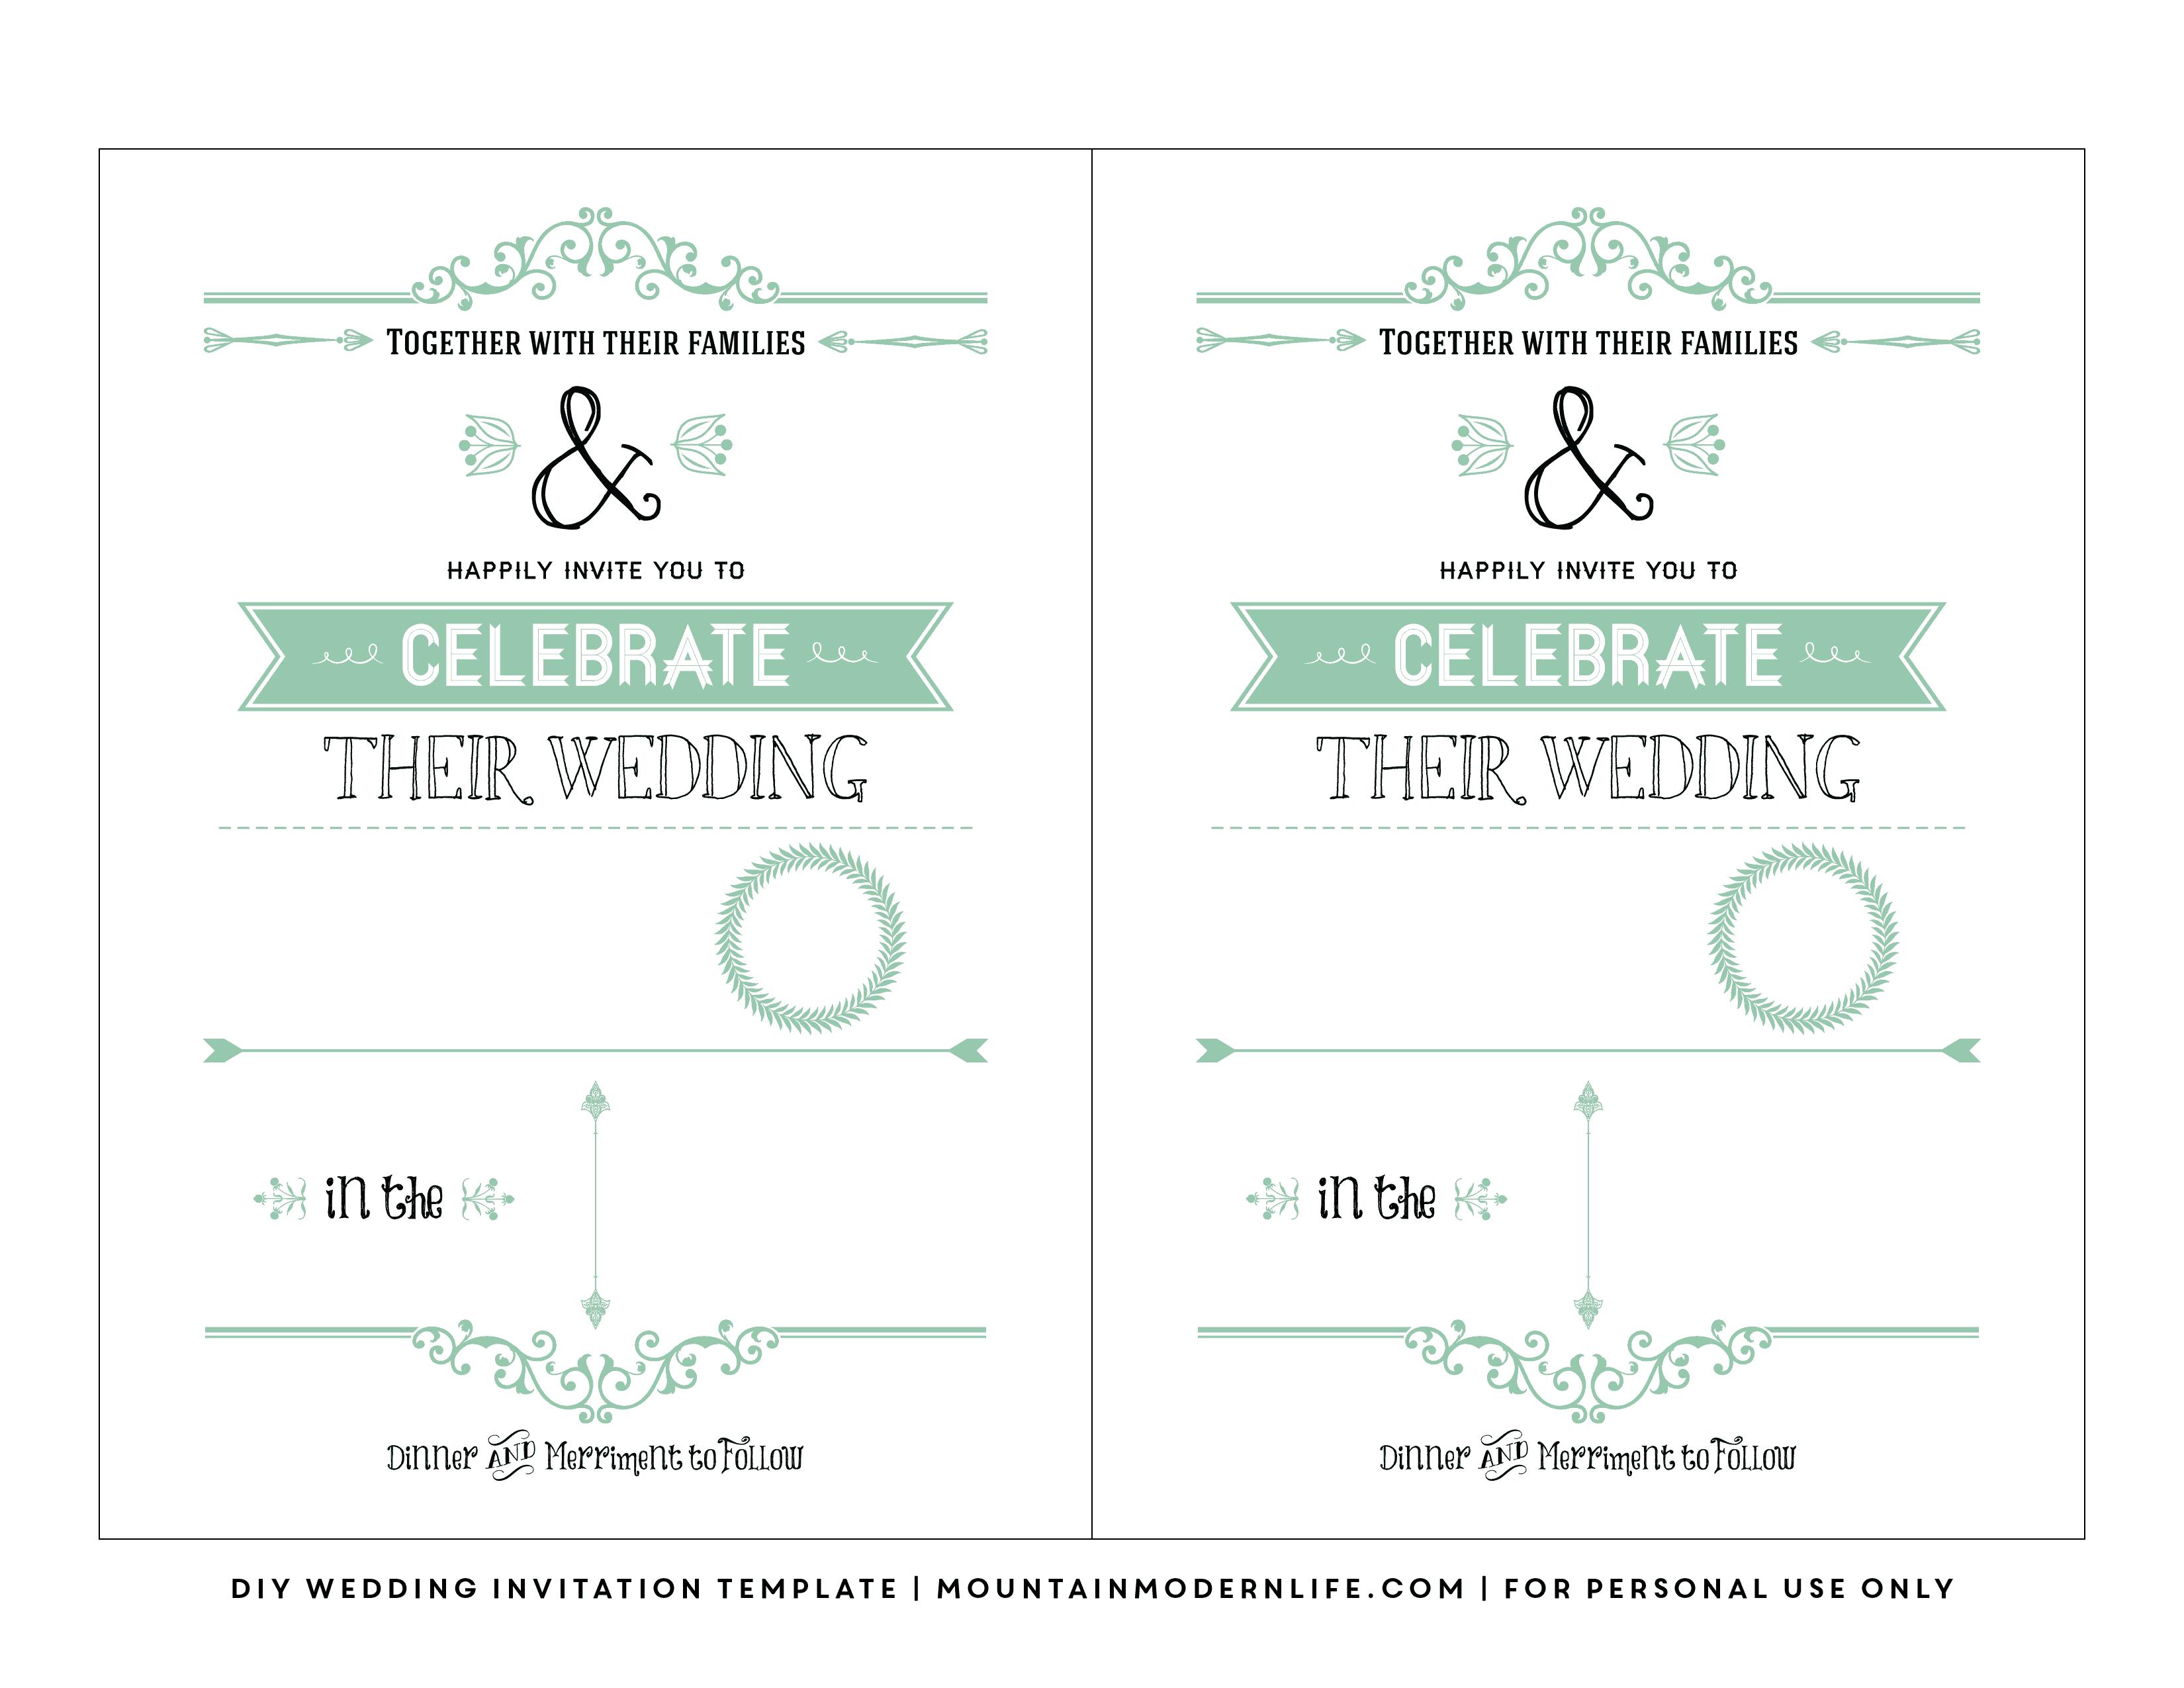 Free Wedding Invitation Template   Mountainmodernlife - Free Printable Wedding Invitation Templates